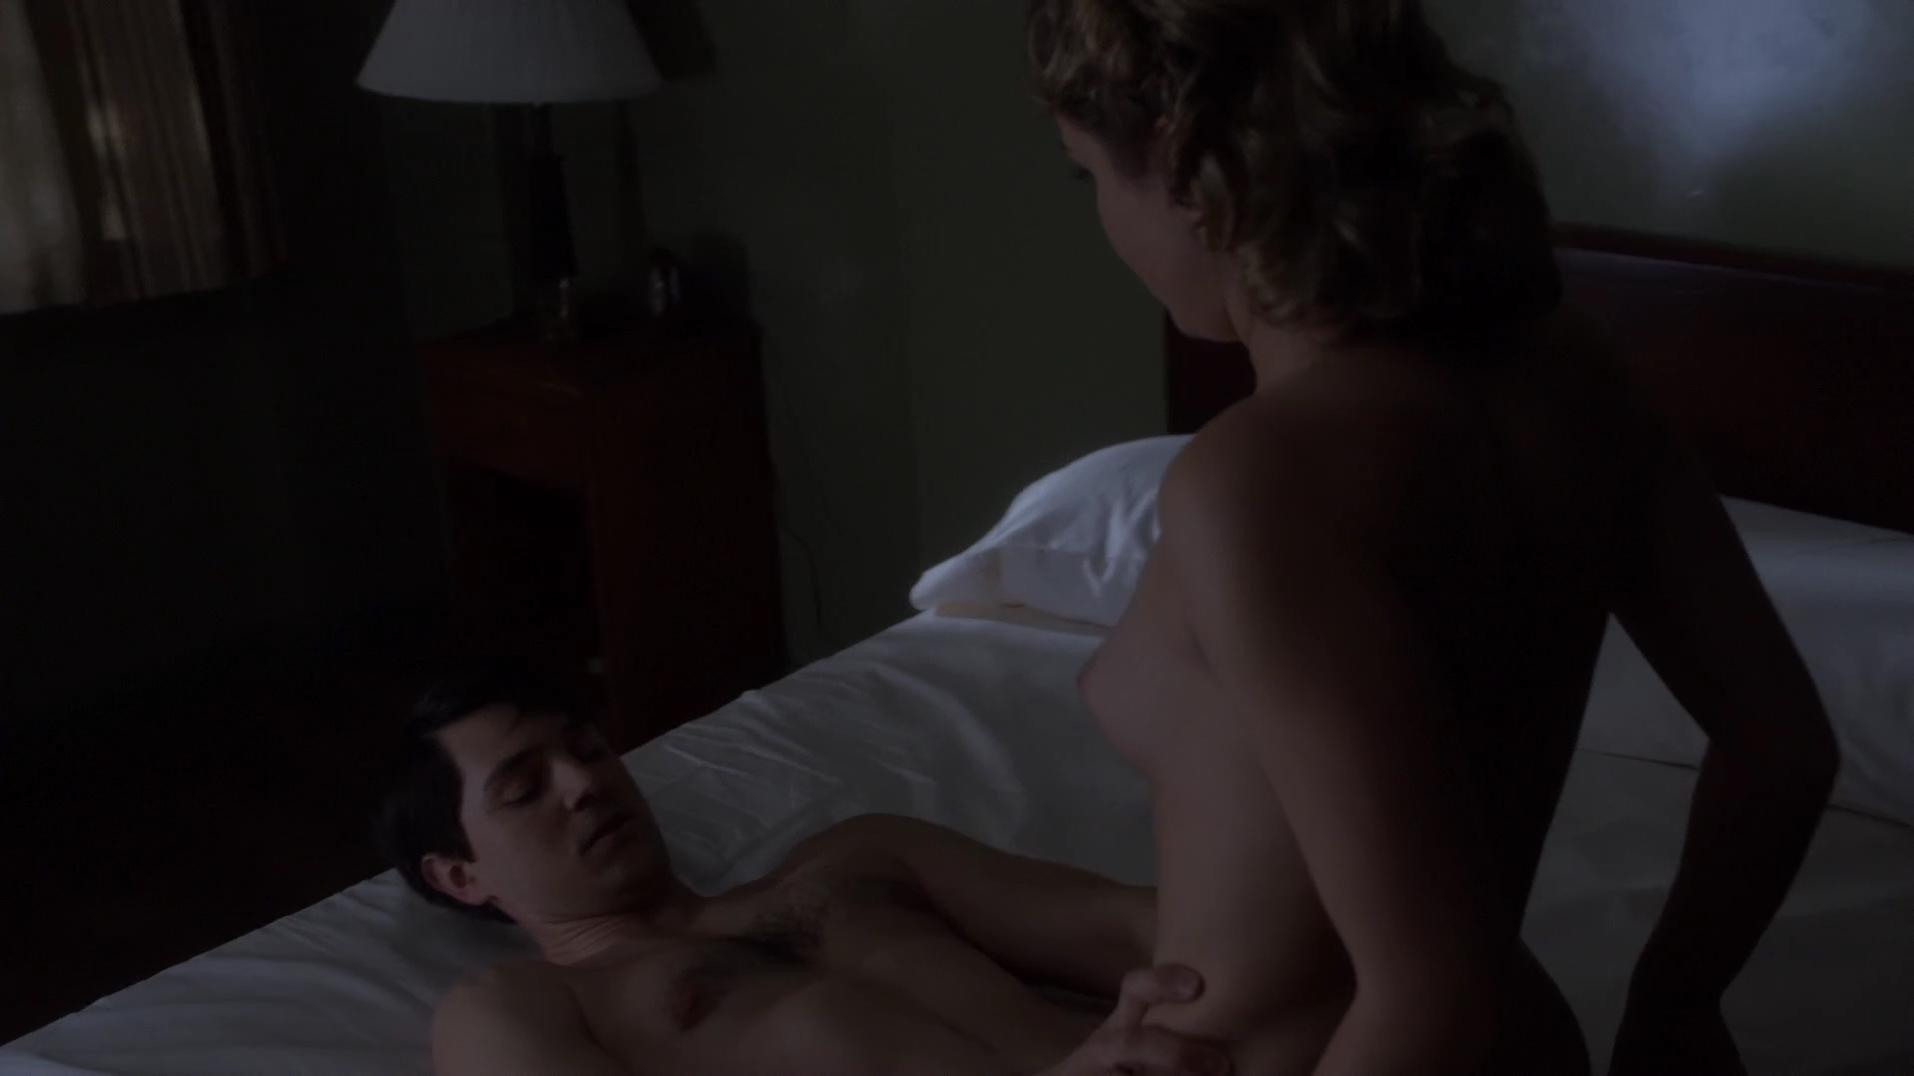 Nude Video Celebs Rose McIver Nude - Masters Of Sex-1501